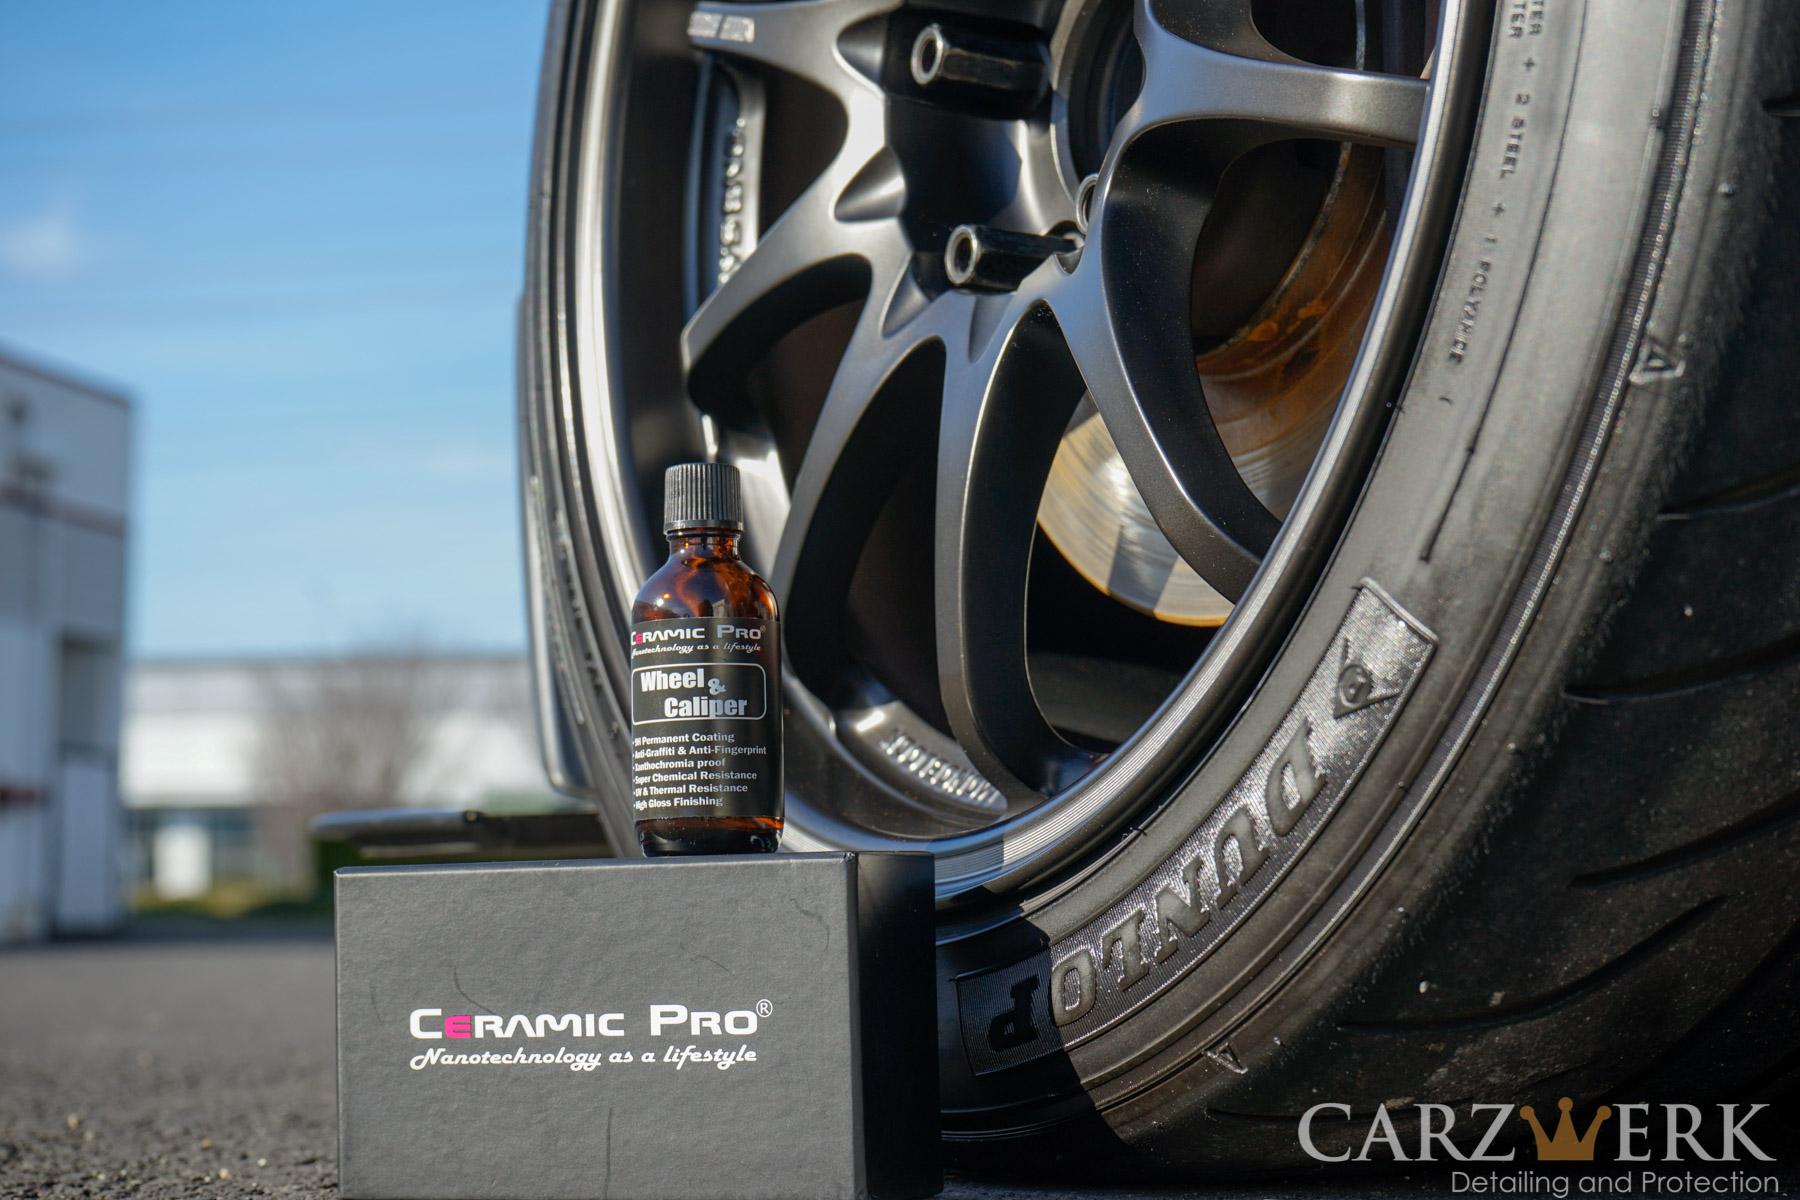 Ceramic Pro Wheel & Caliper Coating  Donated by Carzwerk. Estimated value: $295. 1 winner.